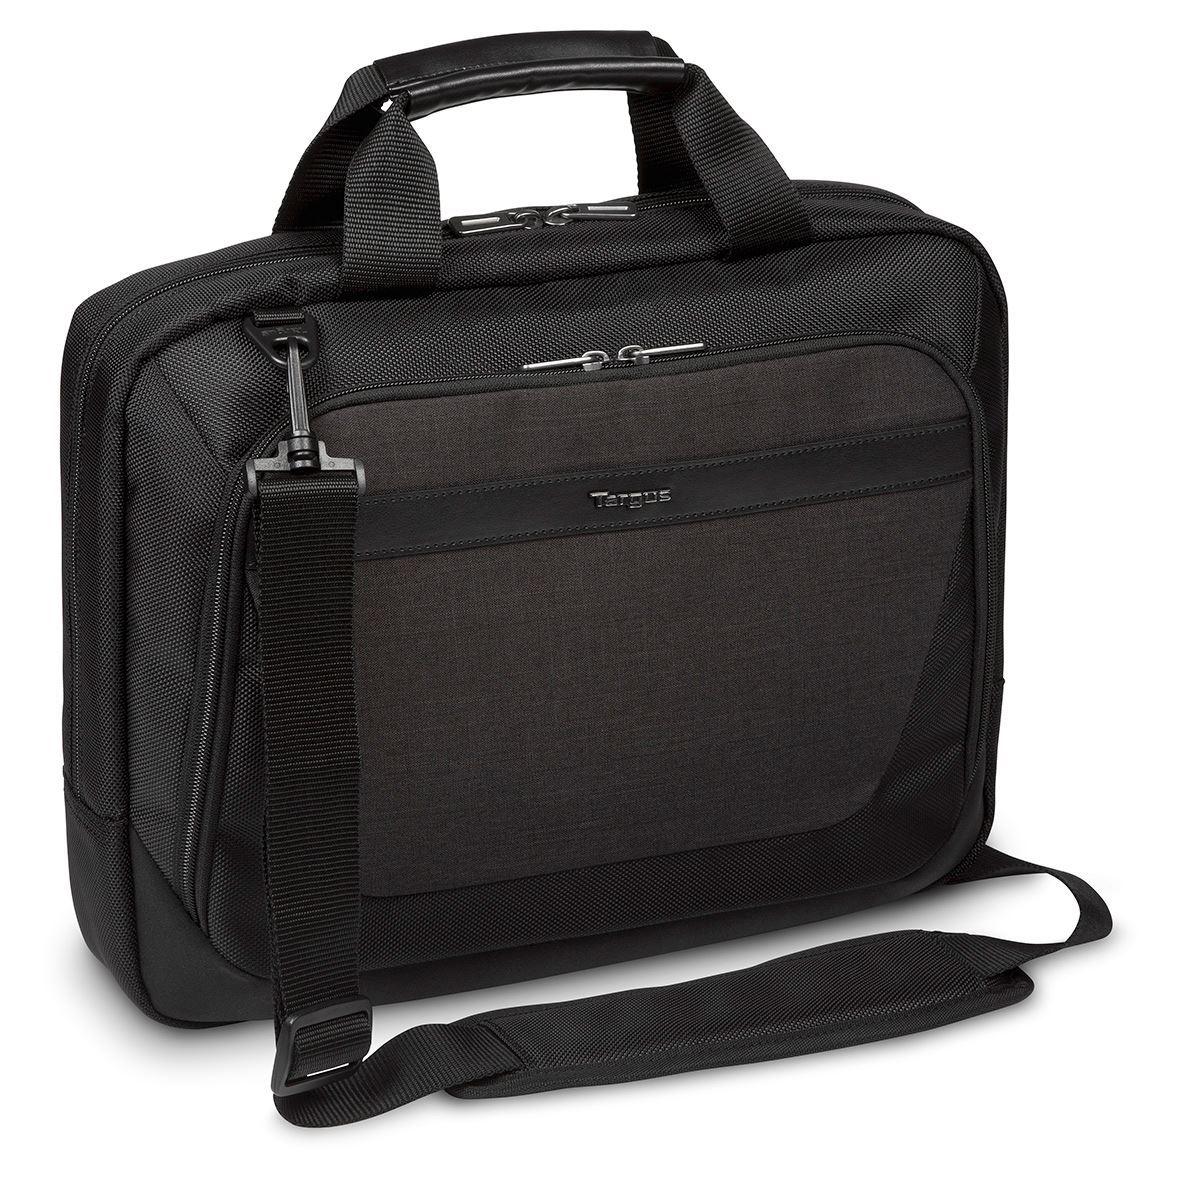 "Targus CitySmart 12, 12.5, 13, 13.3, 14"" SlimlineTopload Laptop Case"